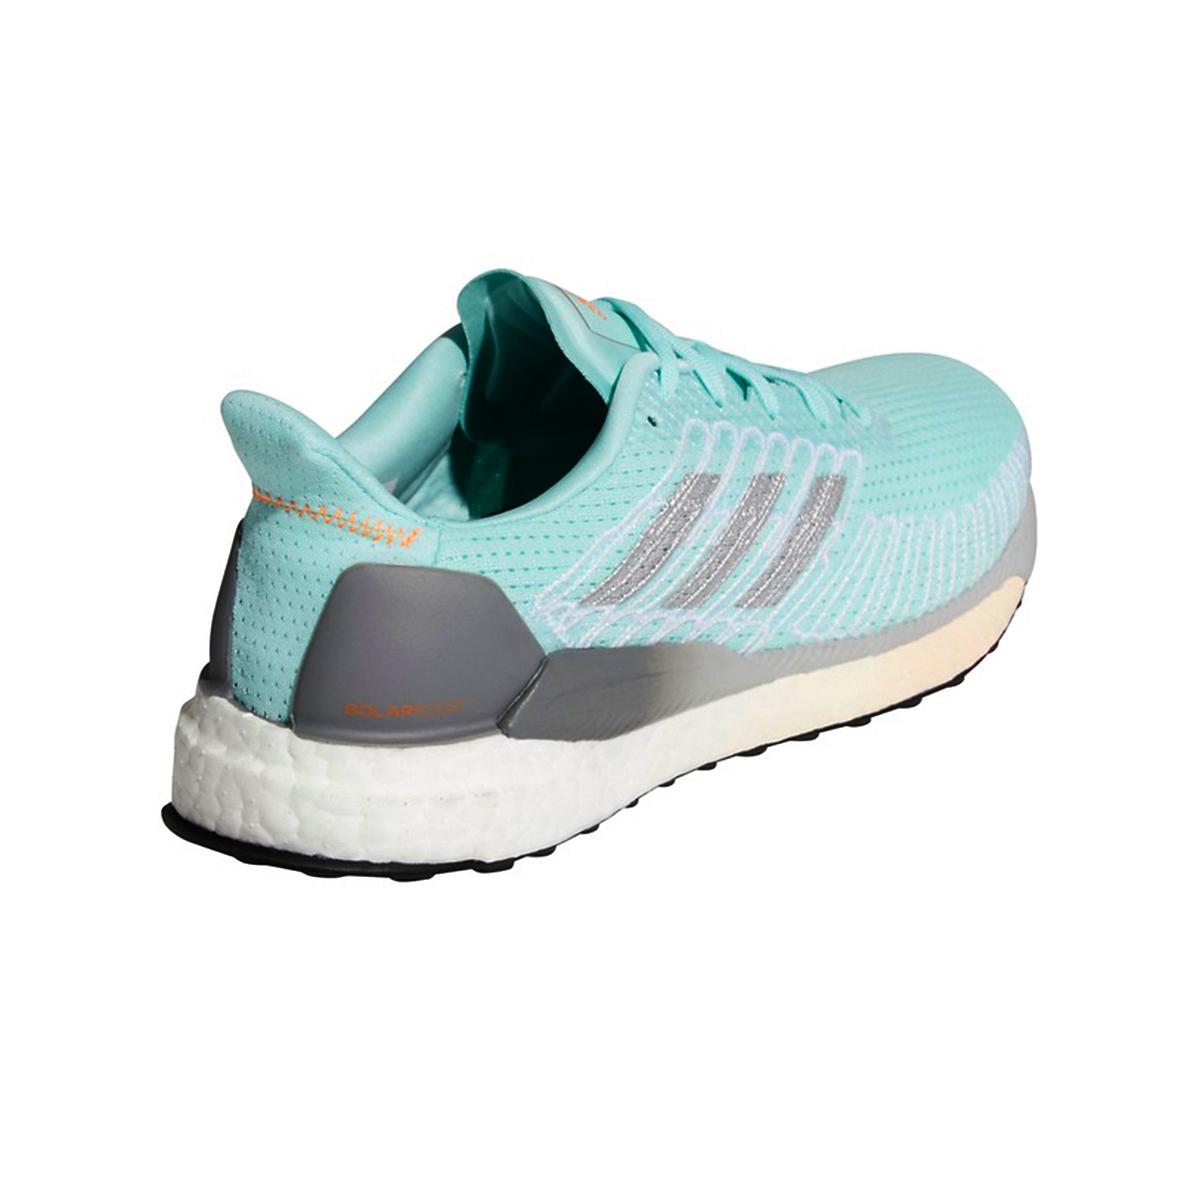 Women's Adidas SolarBOOST 19 Running Shoe - Color: Frost Mint/Silver Metallic/Grey - Size: 5 - Width: Regular, Frost Mint/Silver Metallic/Grey, large, image 4